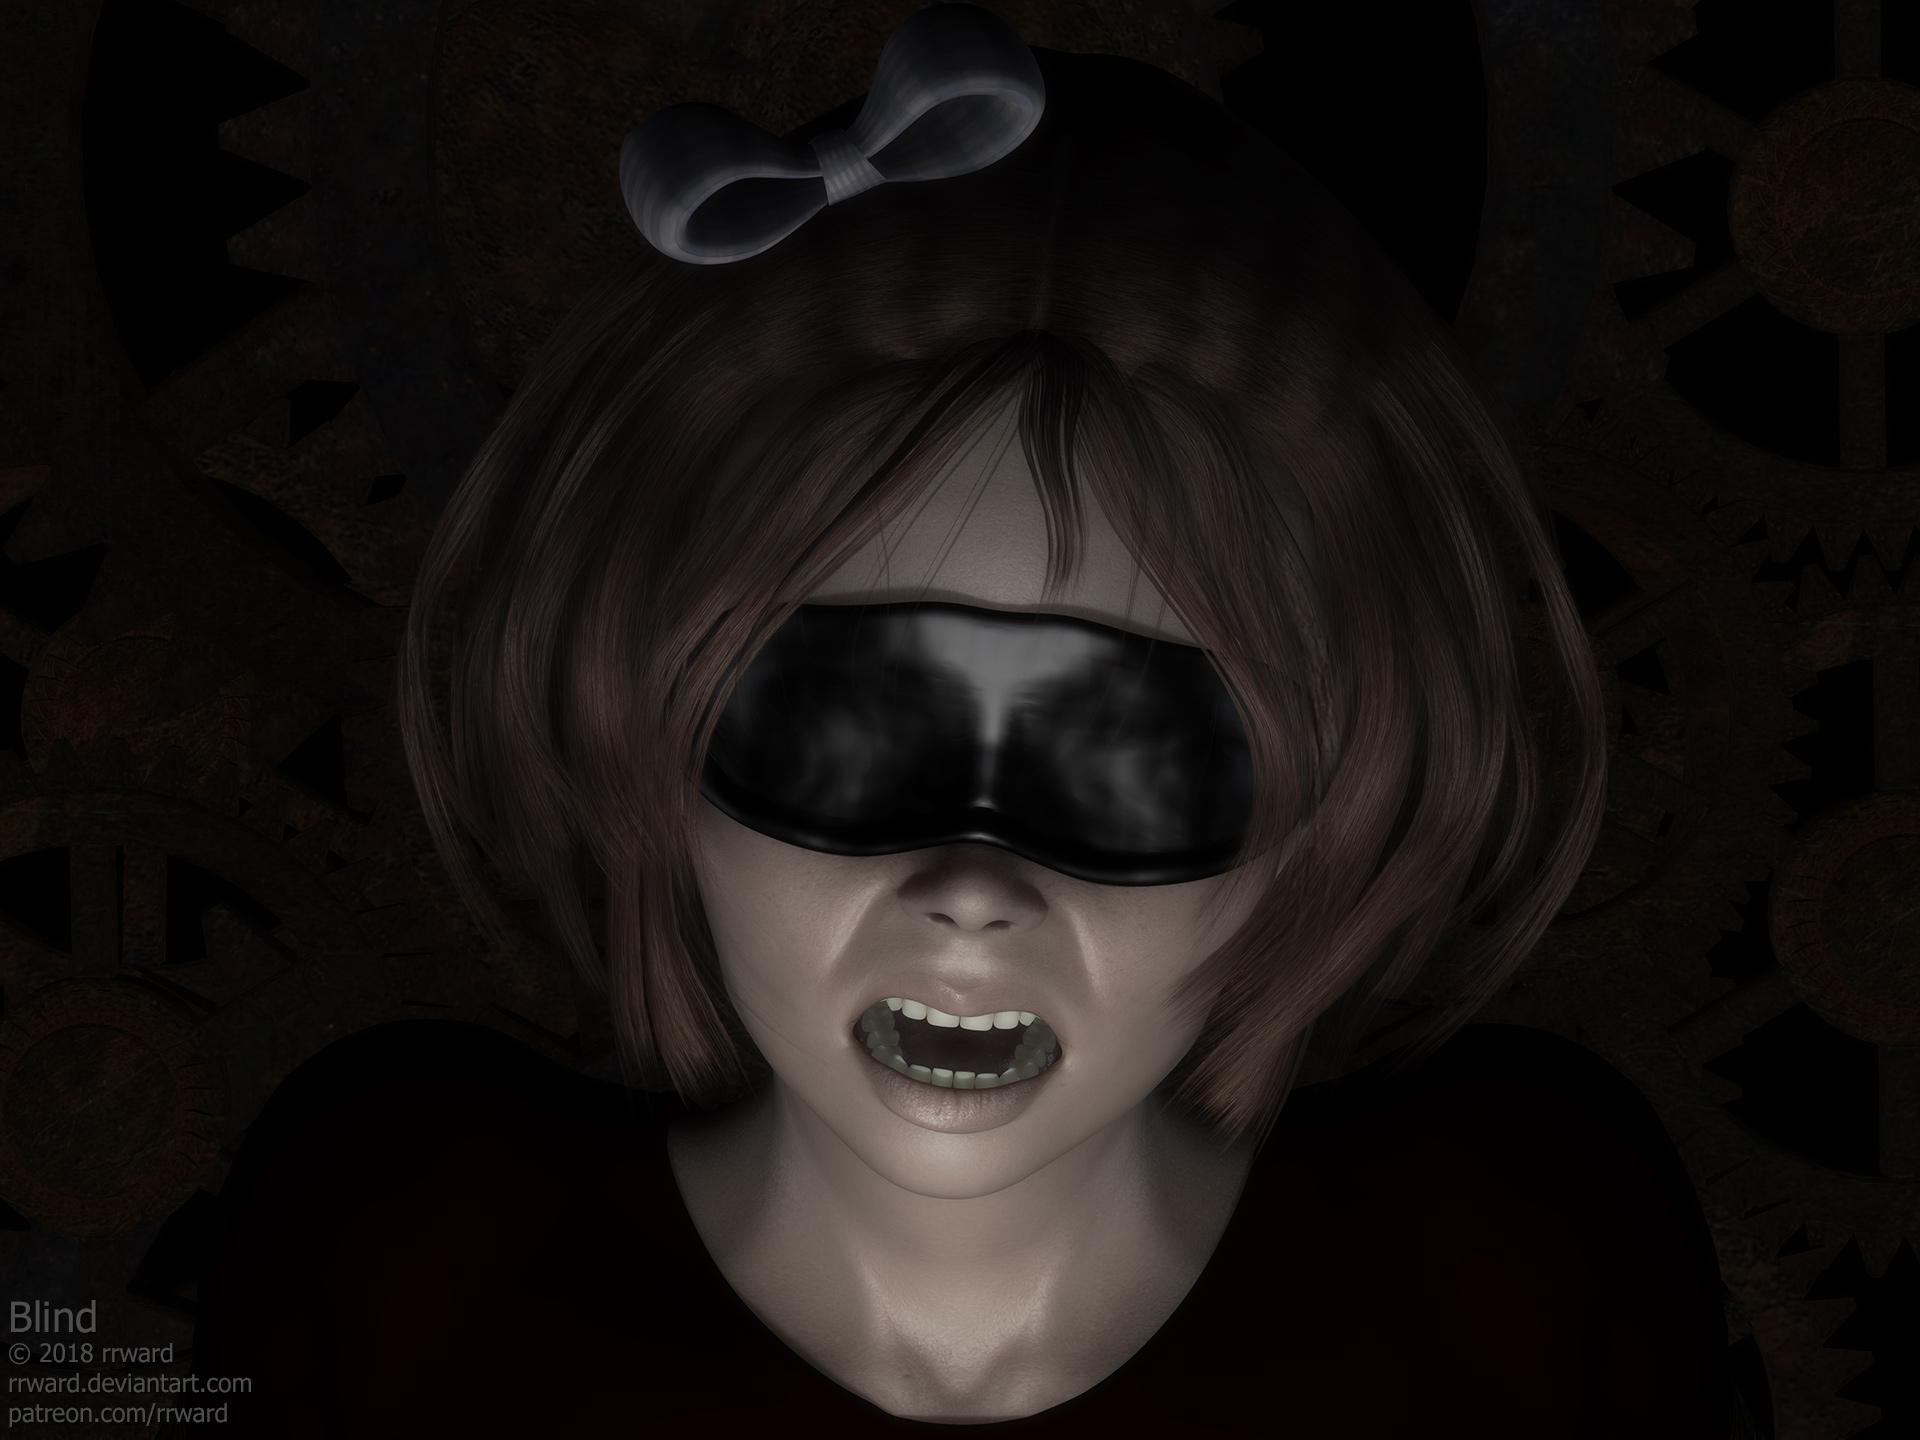 Blind by rrward